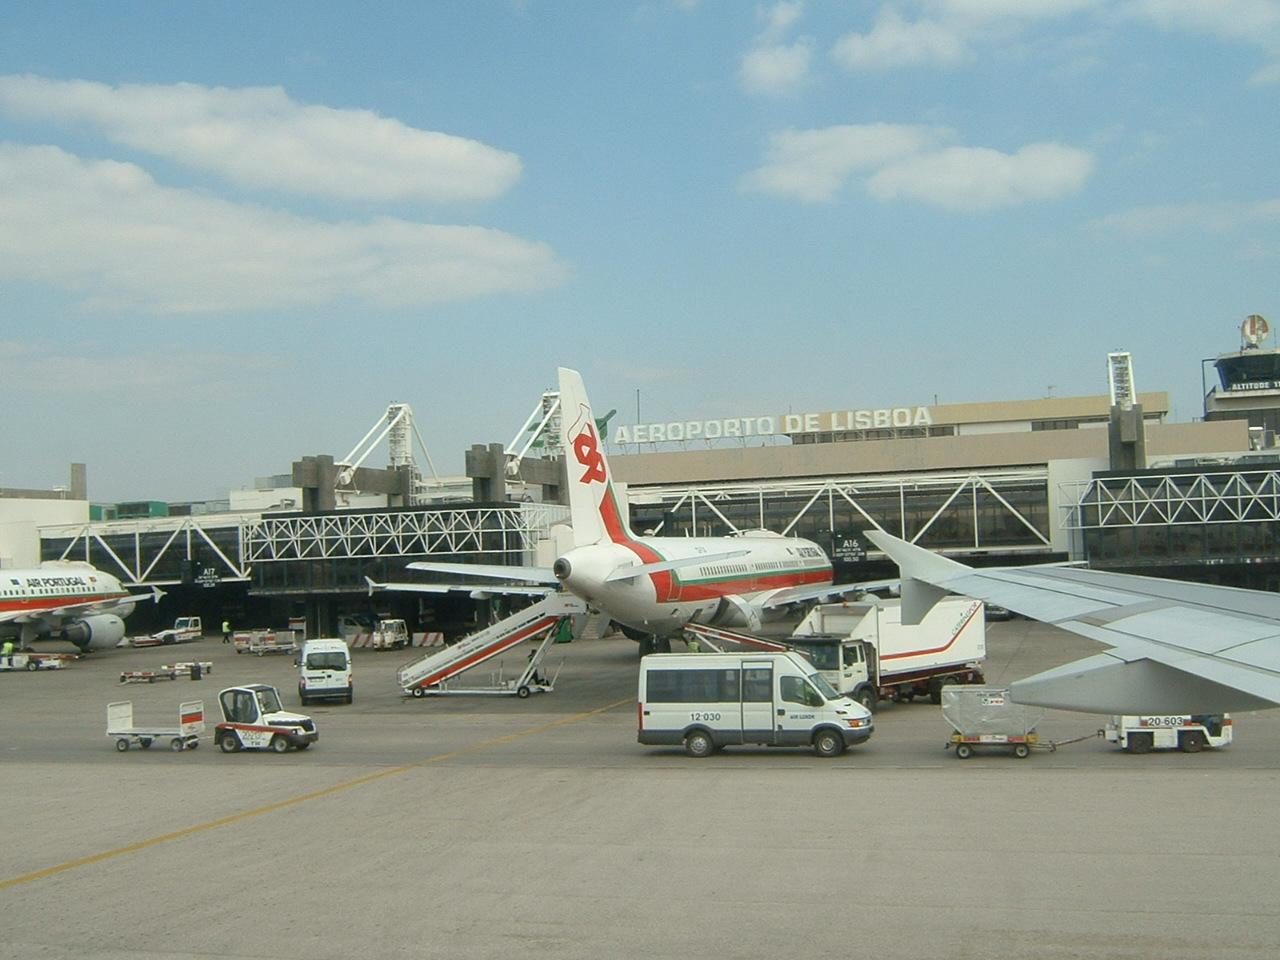 Aeroporto Lisbona : Geografia a rede nacional de aeroportos